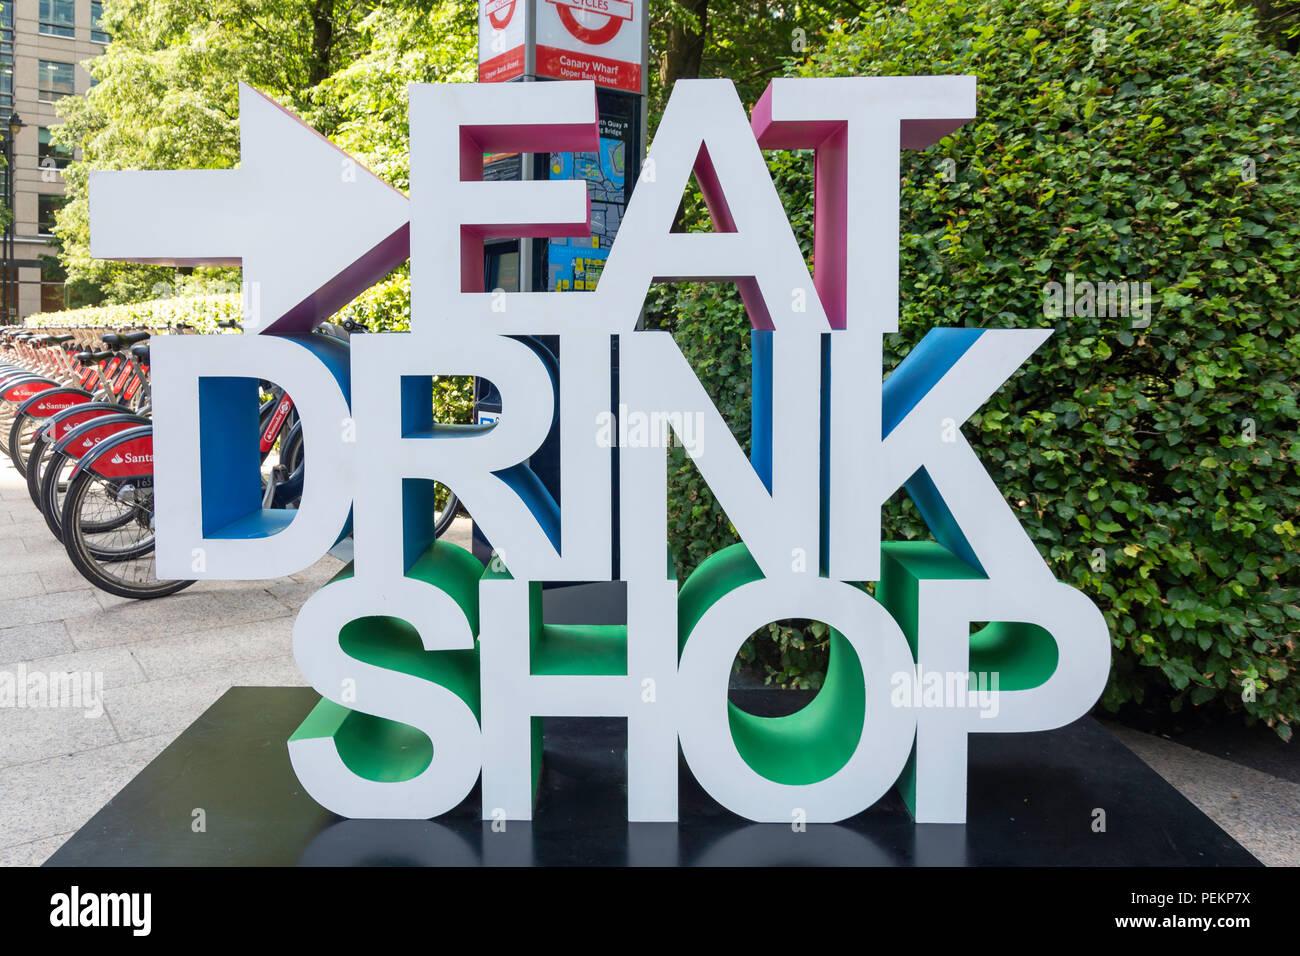 Essen, Trinken, Shop anmelden Jubilee Park, Canary Wharf, London Borough Tower Hamlets, London, Greater London, England, Vereinigtes Königreich Stockbild